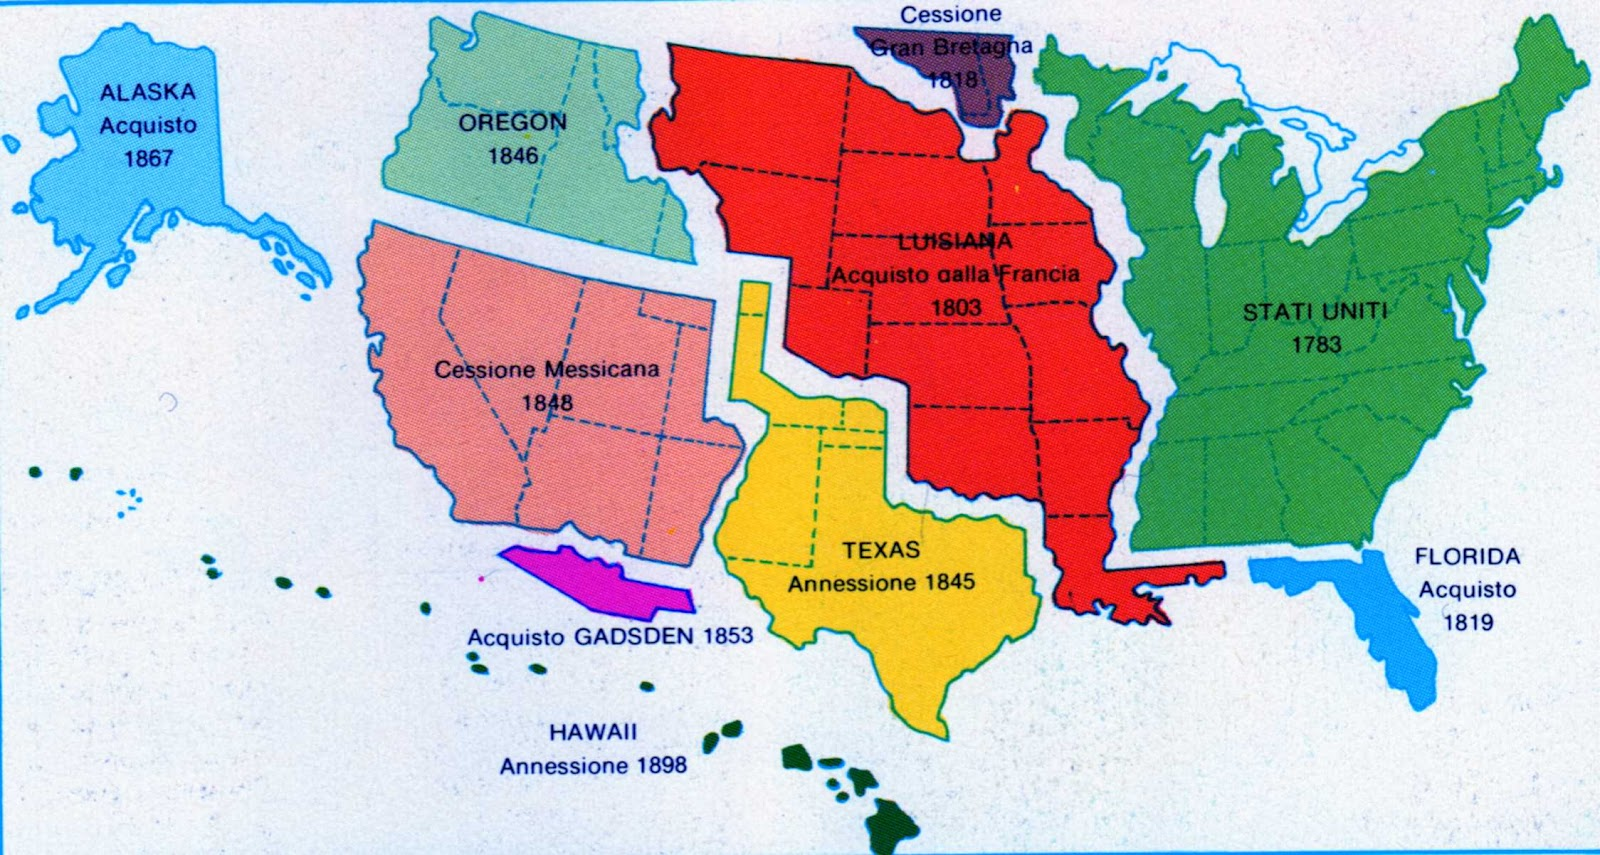 Cartina Mondo Politica Con Capitali.Cartina Politica Usa Con Stati